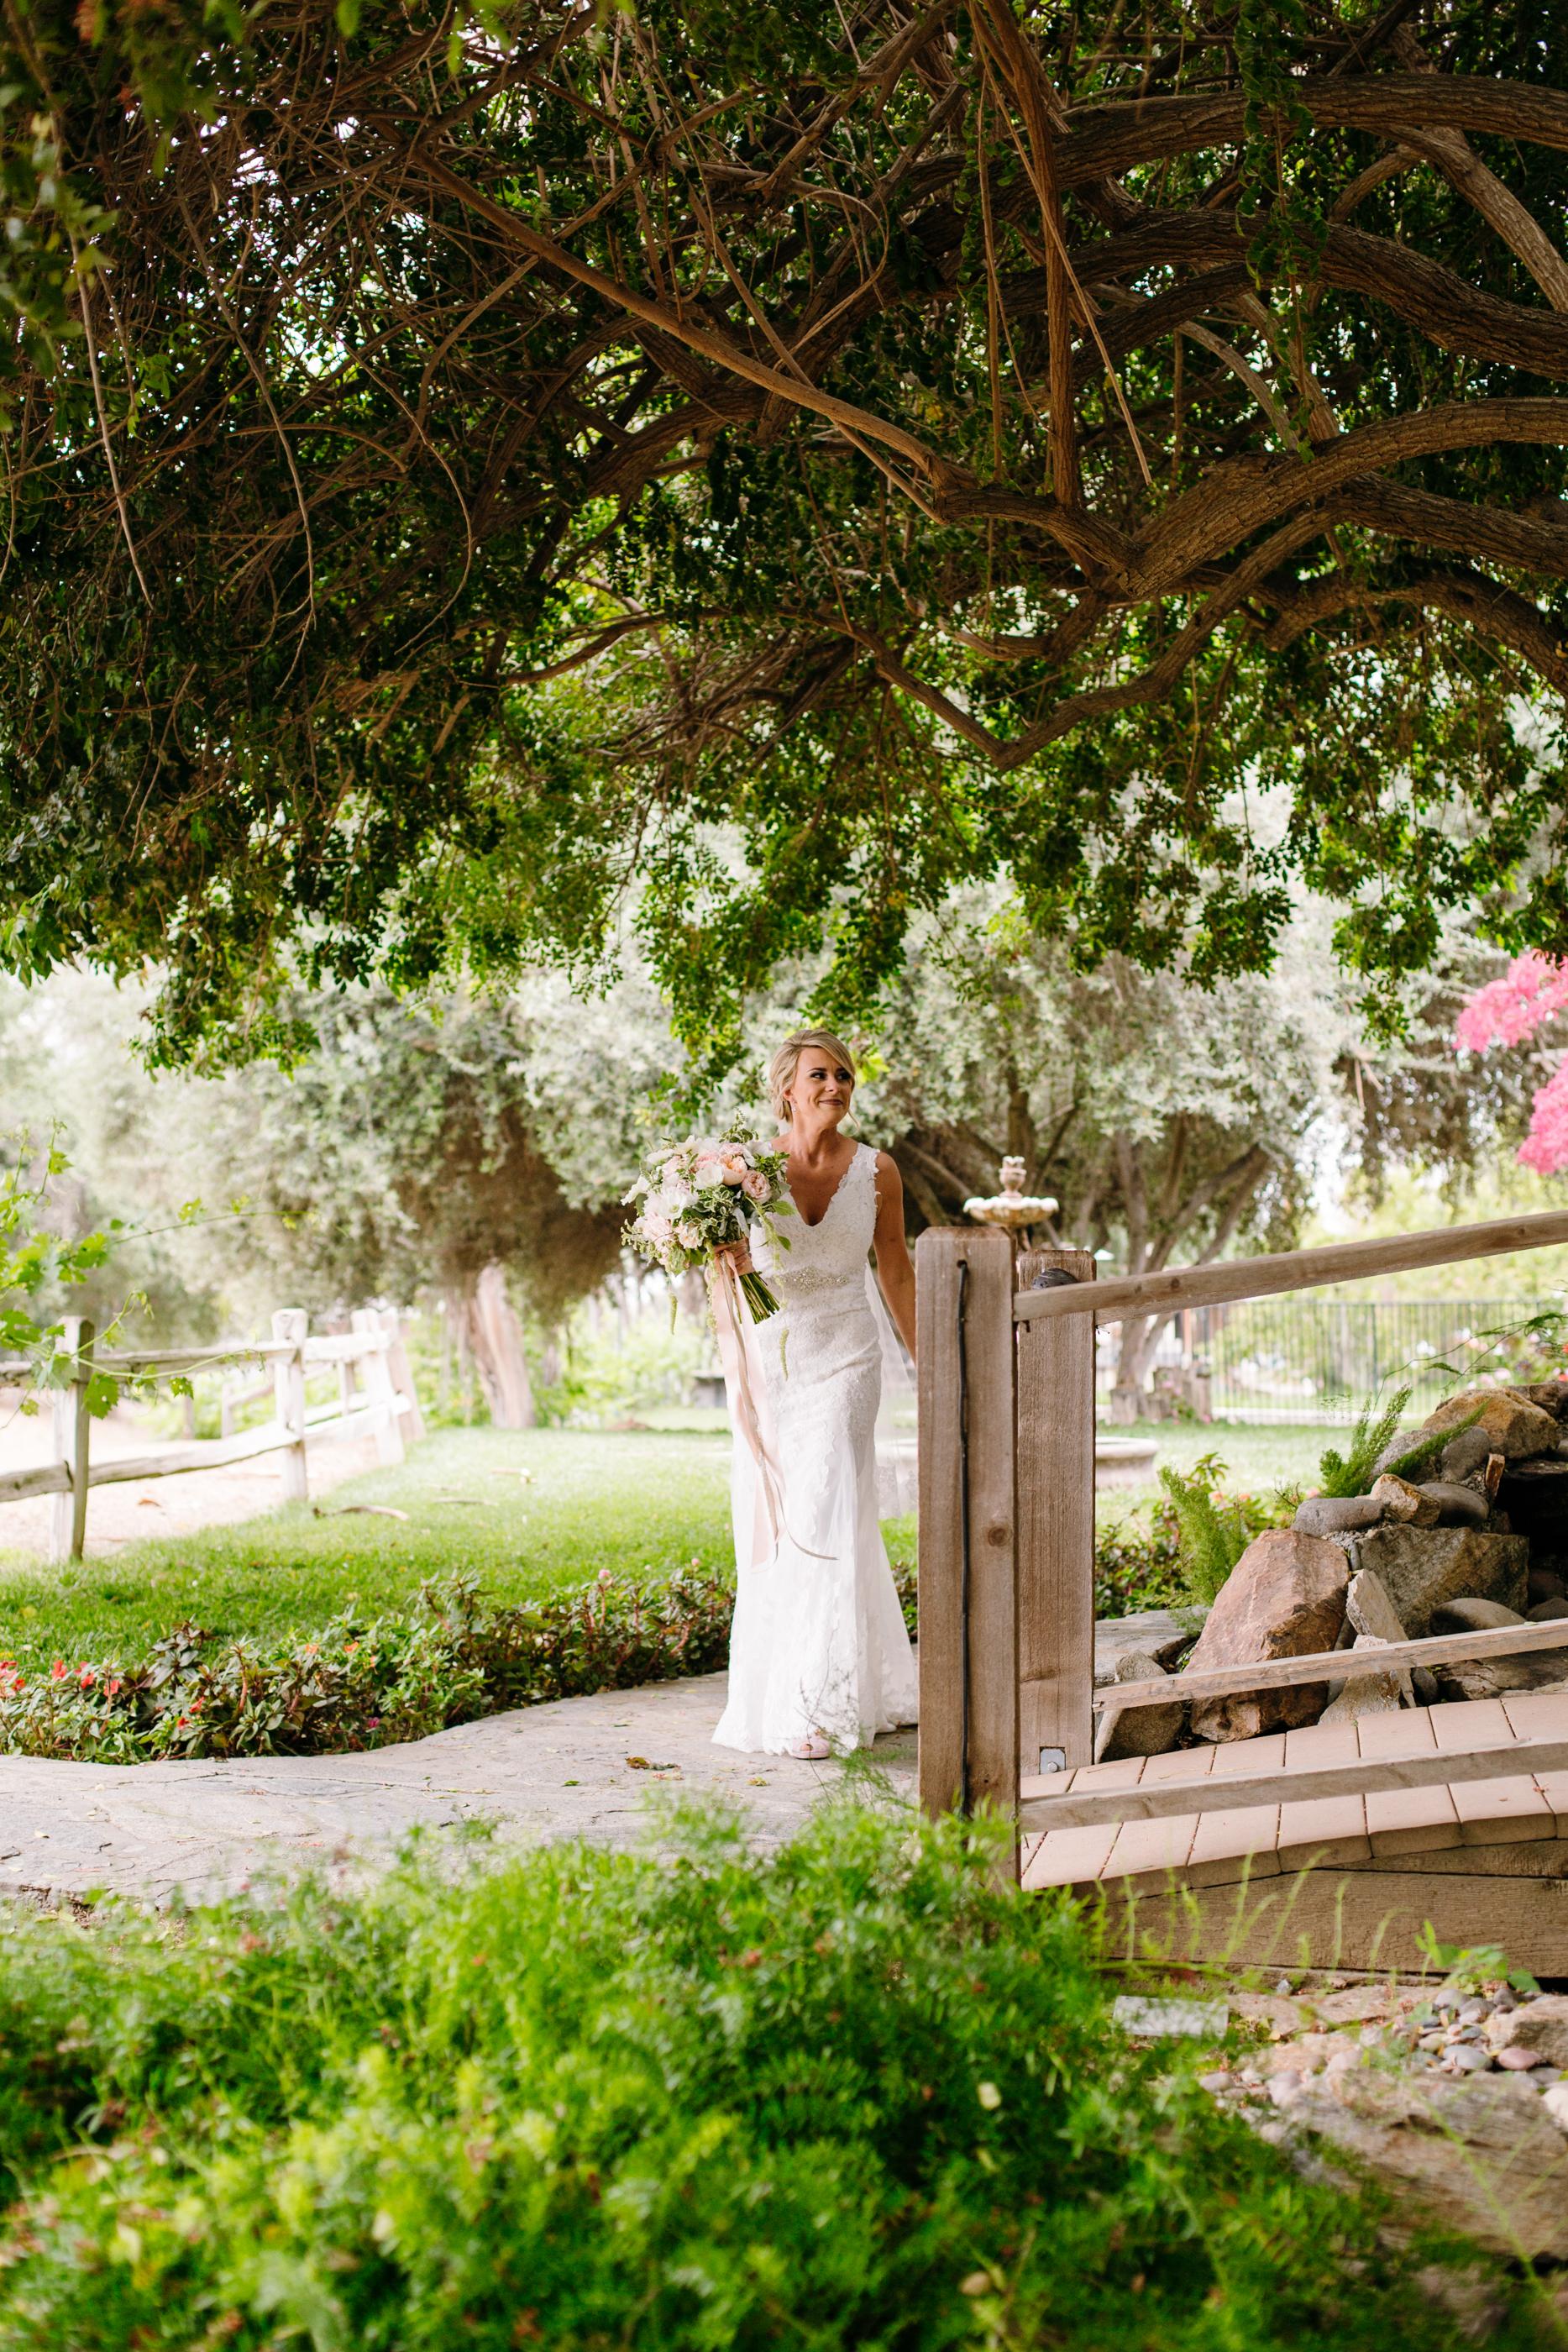 KaraNixonWeddings-LakeOakMeadows-Temecula-Wedding-14.jpg